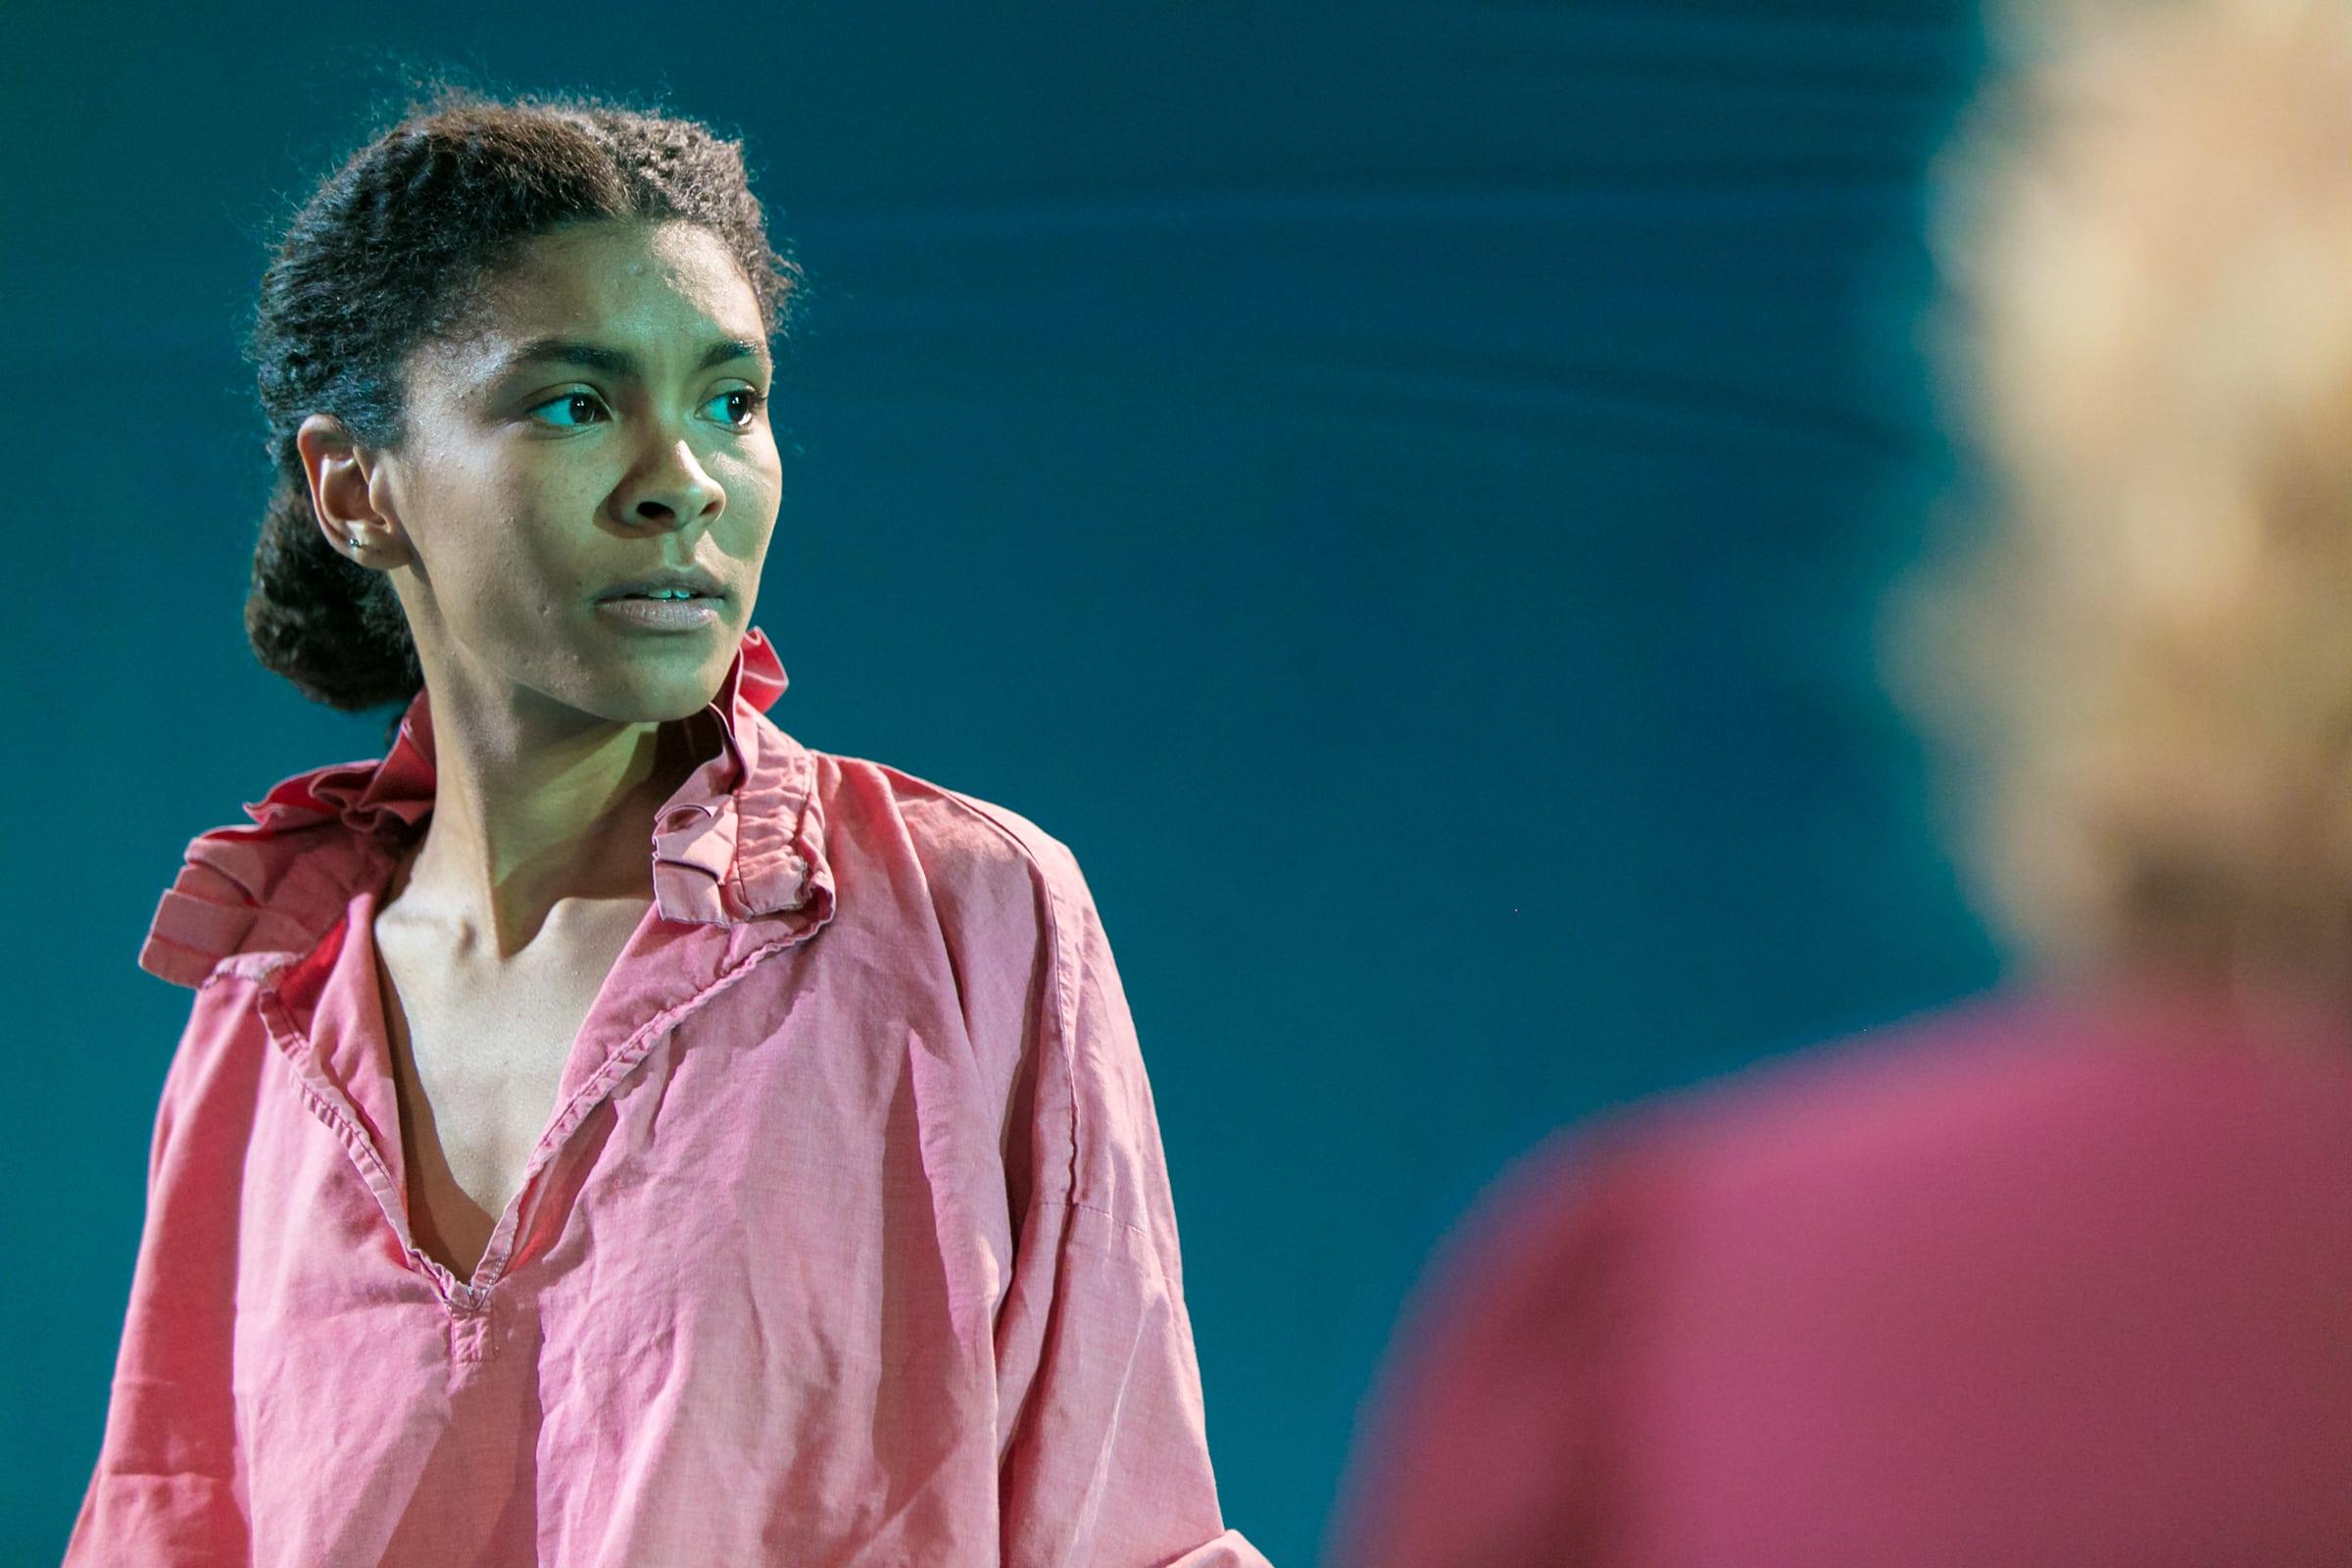 Thalissa teixeira the unknown island gate theatre 2017 c cameron slater 2